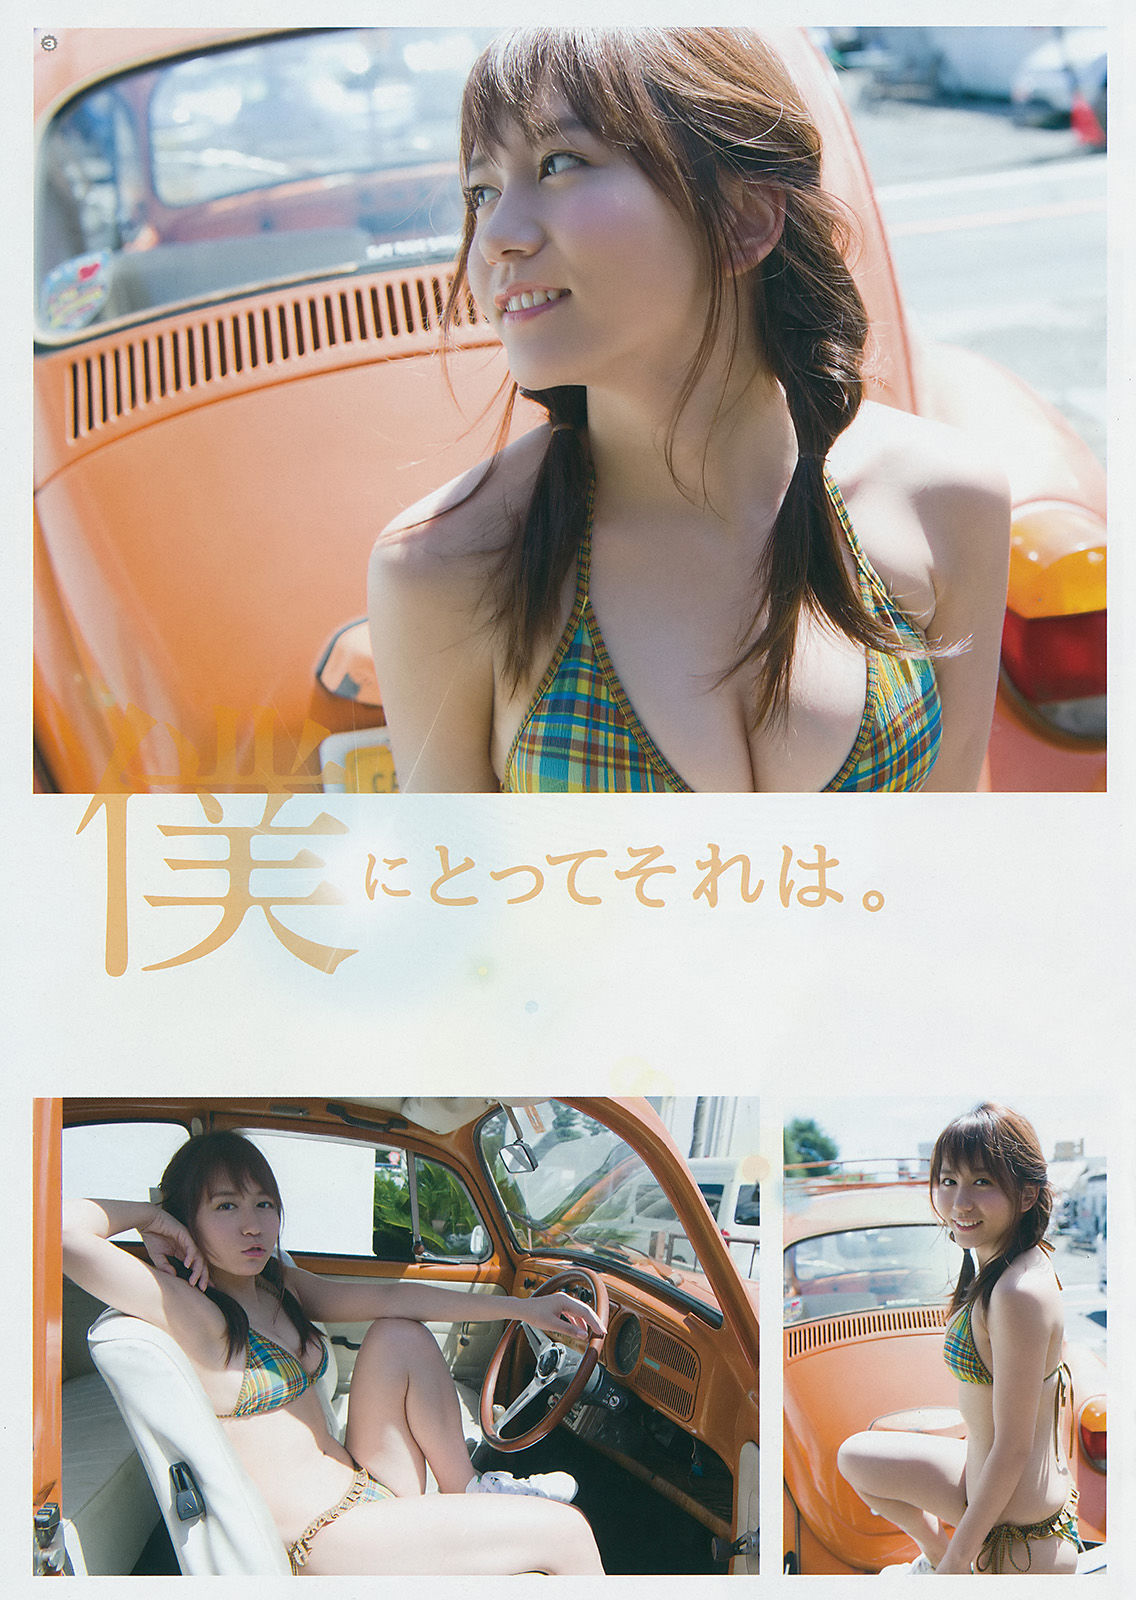 VOL.343 [Young Gangan]日本嫩模:大场美奈超高清写真套图(36P)